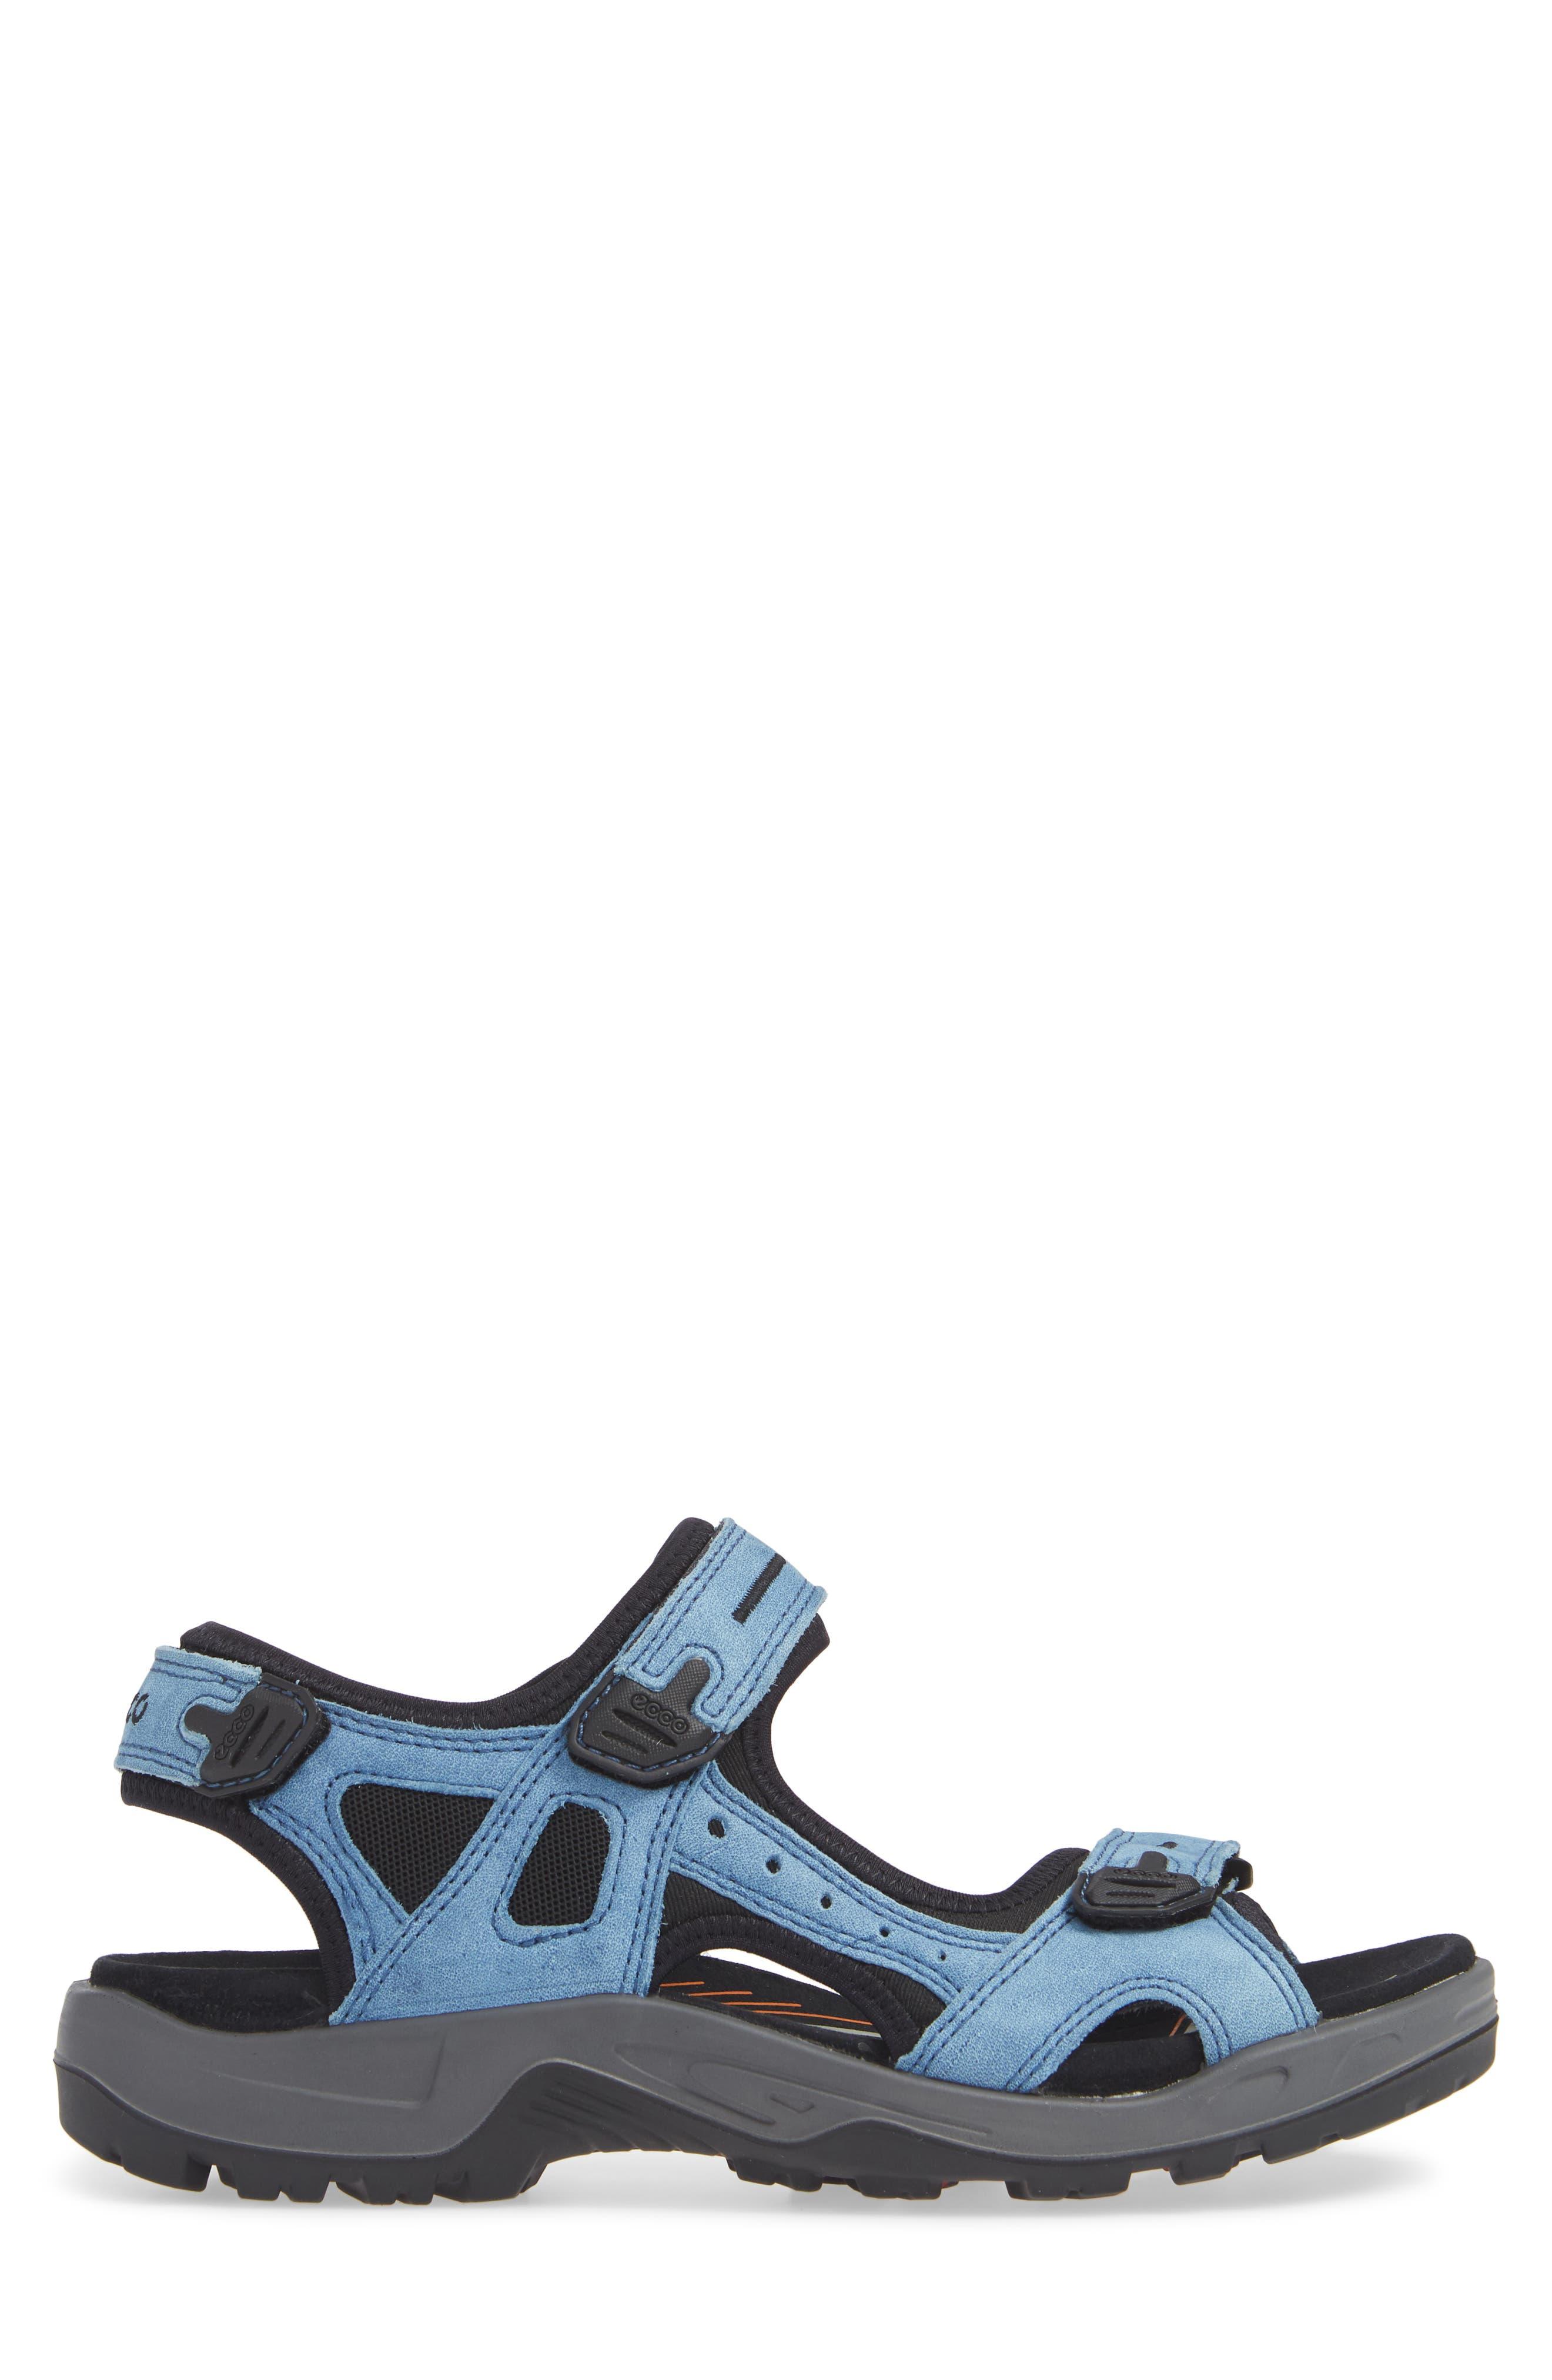 Offroad Sport Sandal,                             Alternate thumbnail 3, color,                             INDIGO LEATHER